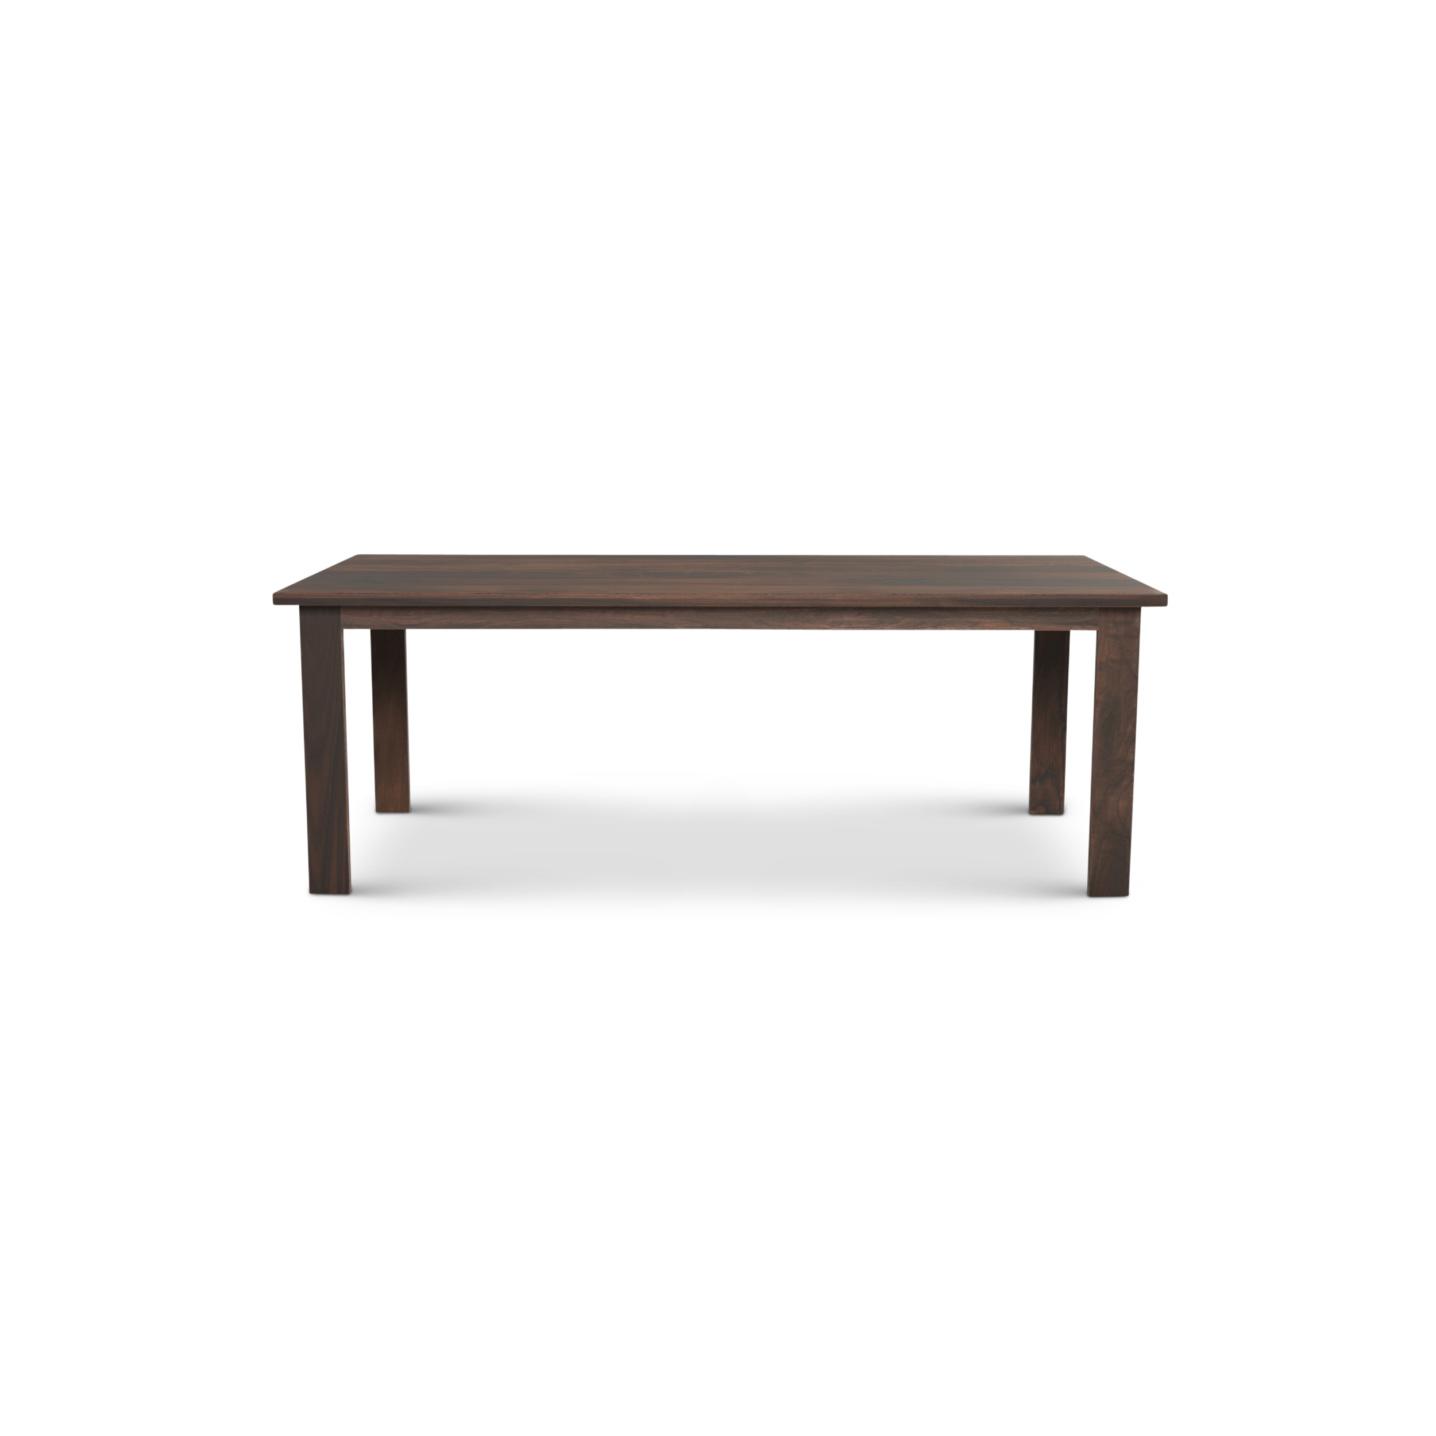 7 foot Solid Walnut table